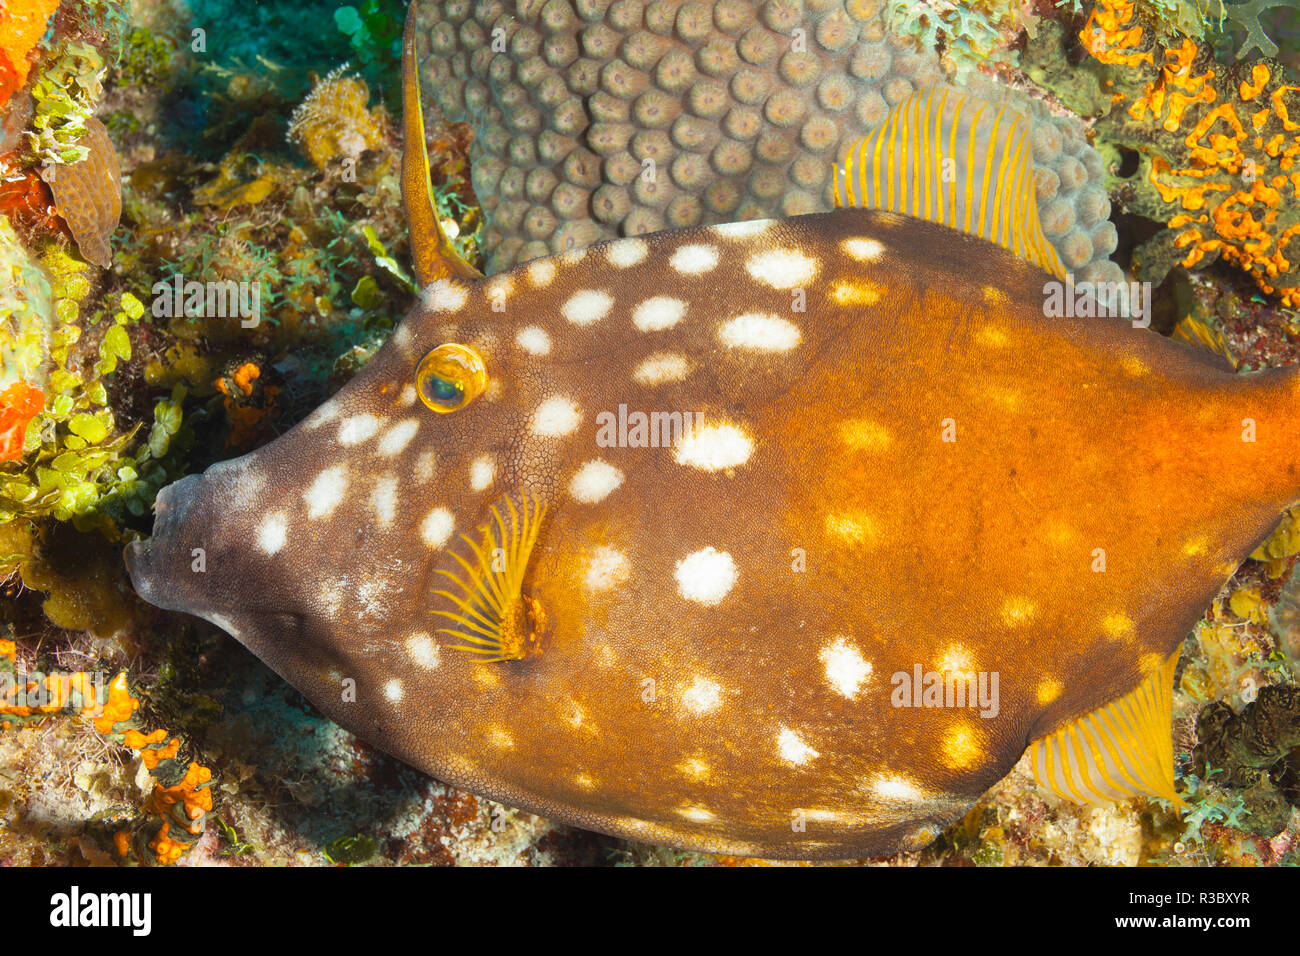 Nördlichen Bahamas, Karibik. Filefish. Stockbild